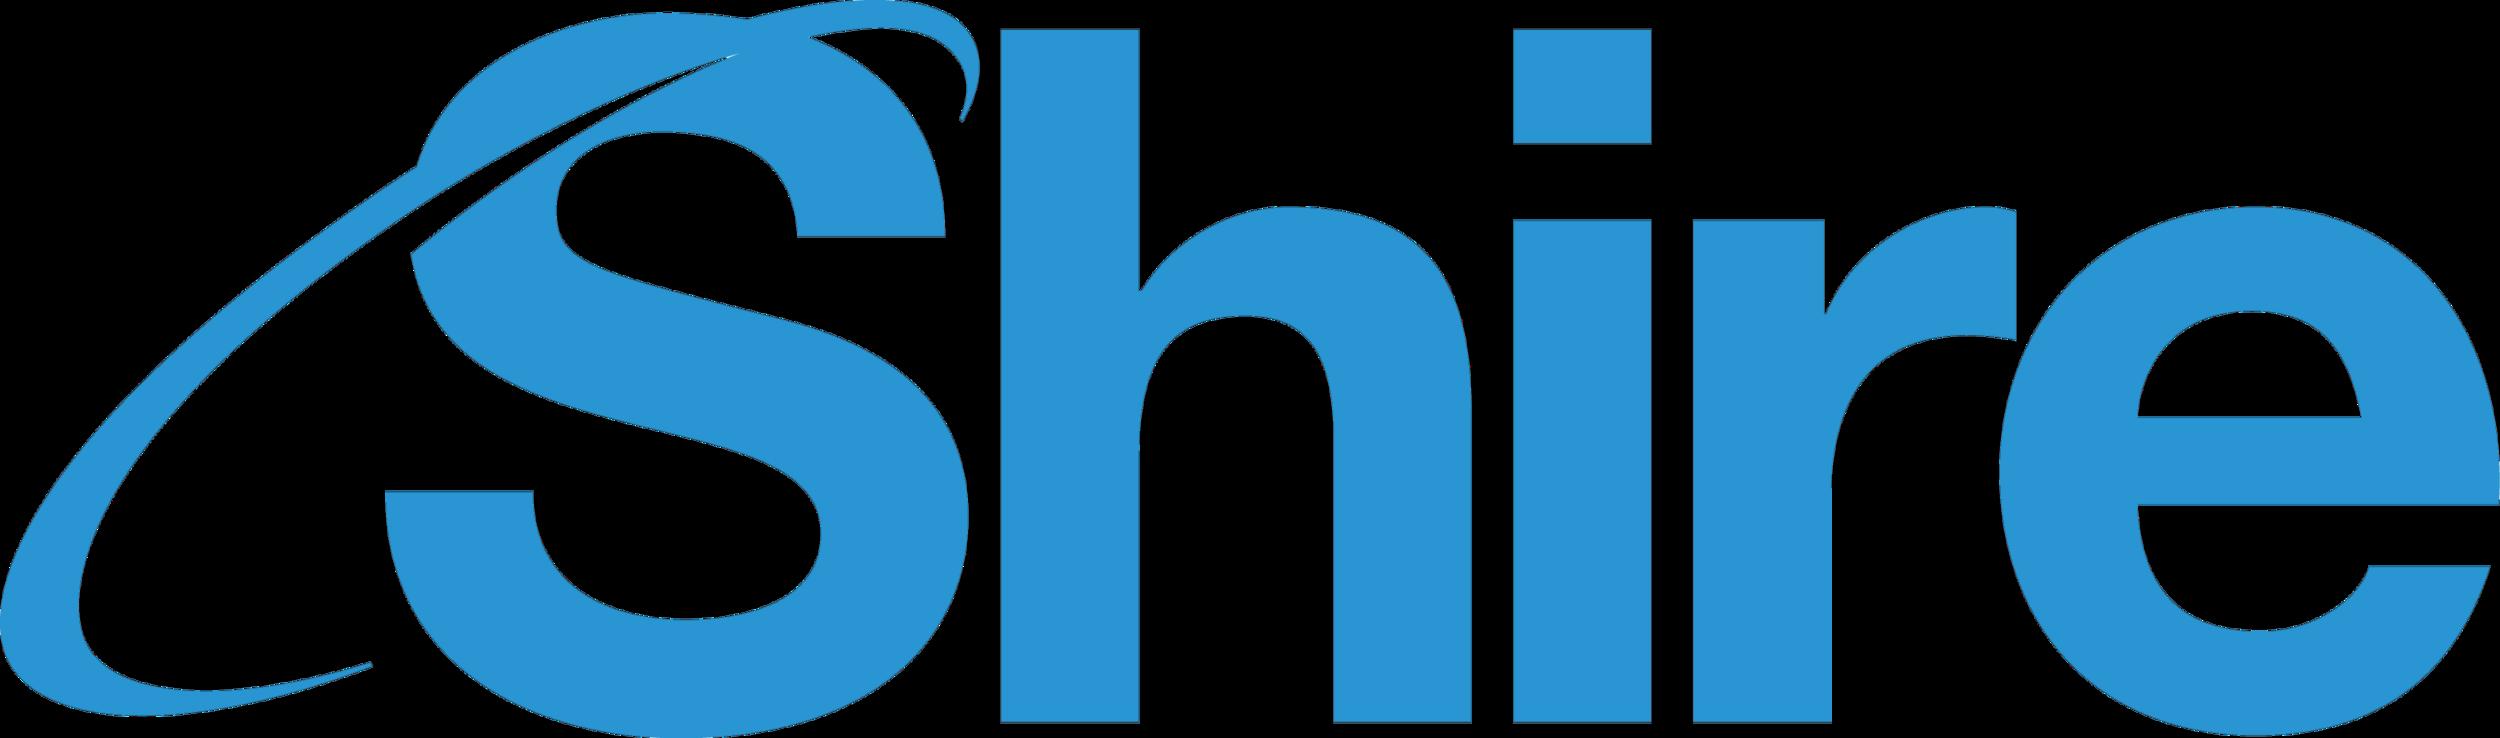 Shire Logo Transparent.png